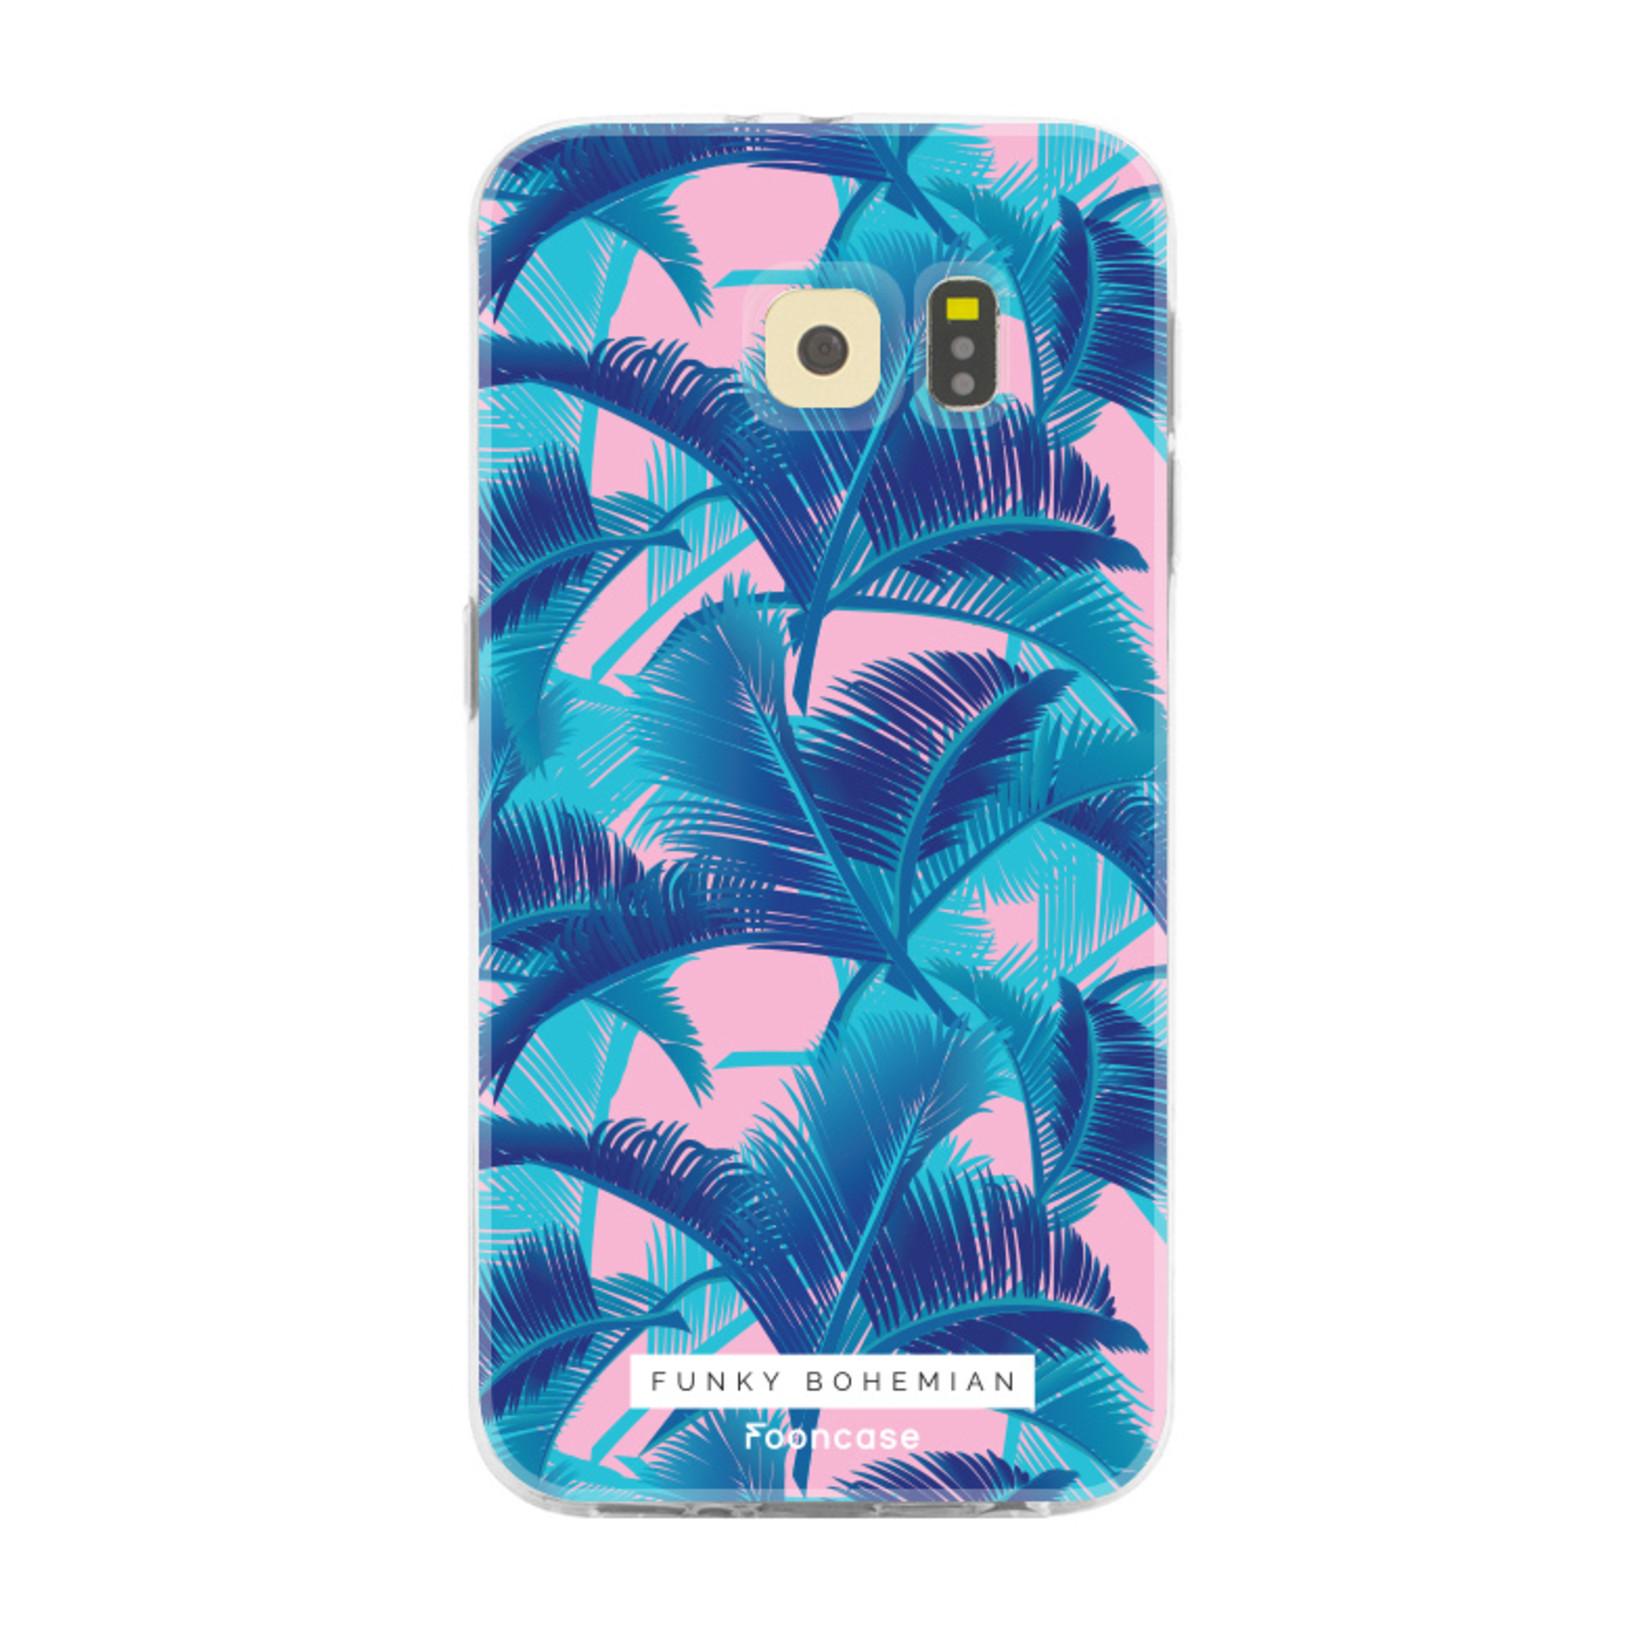 FOONCASE Samsung Galaxy S6 Edge Handyhülle - Funky Bohemian